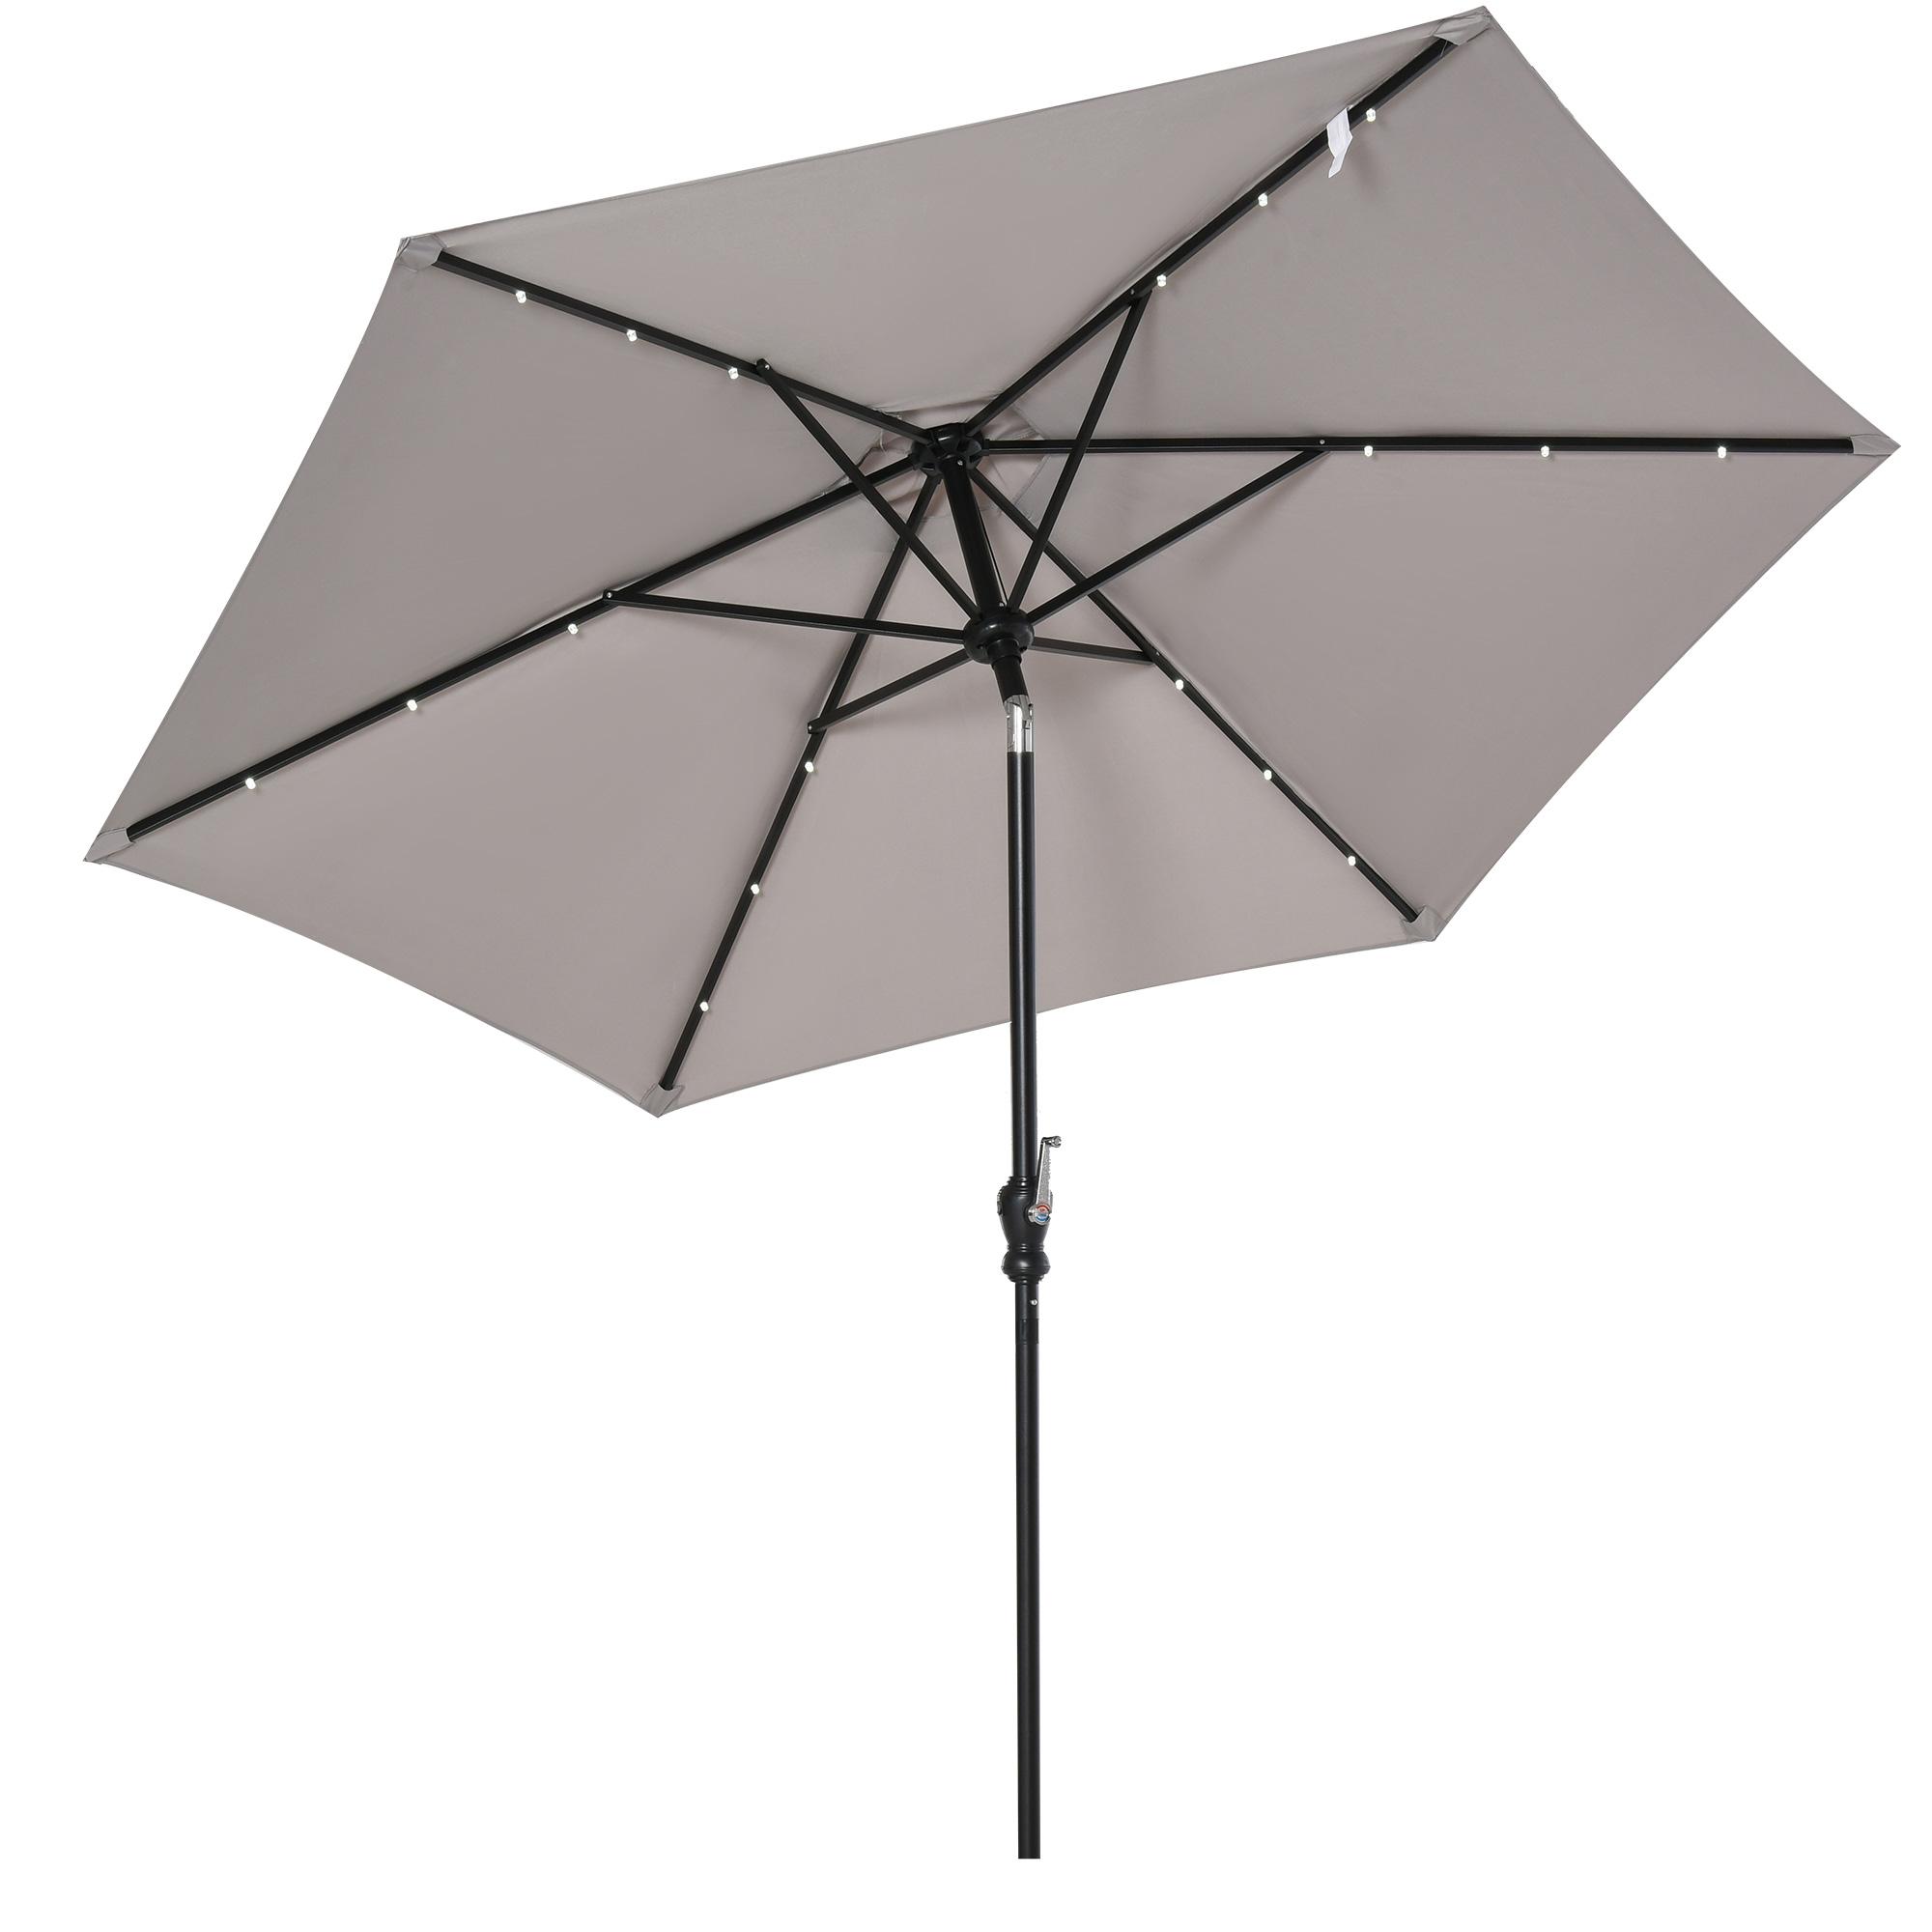 Parasol lumineux hexagonal inclinable parasol LED gris